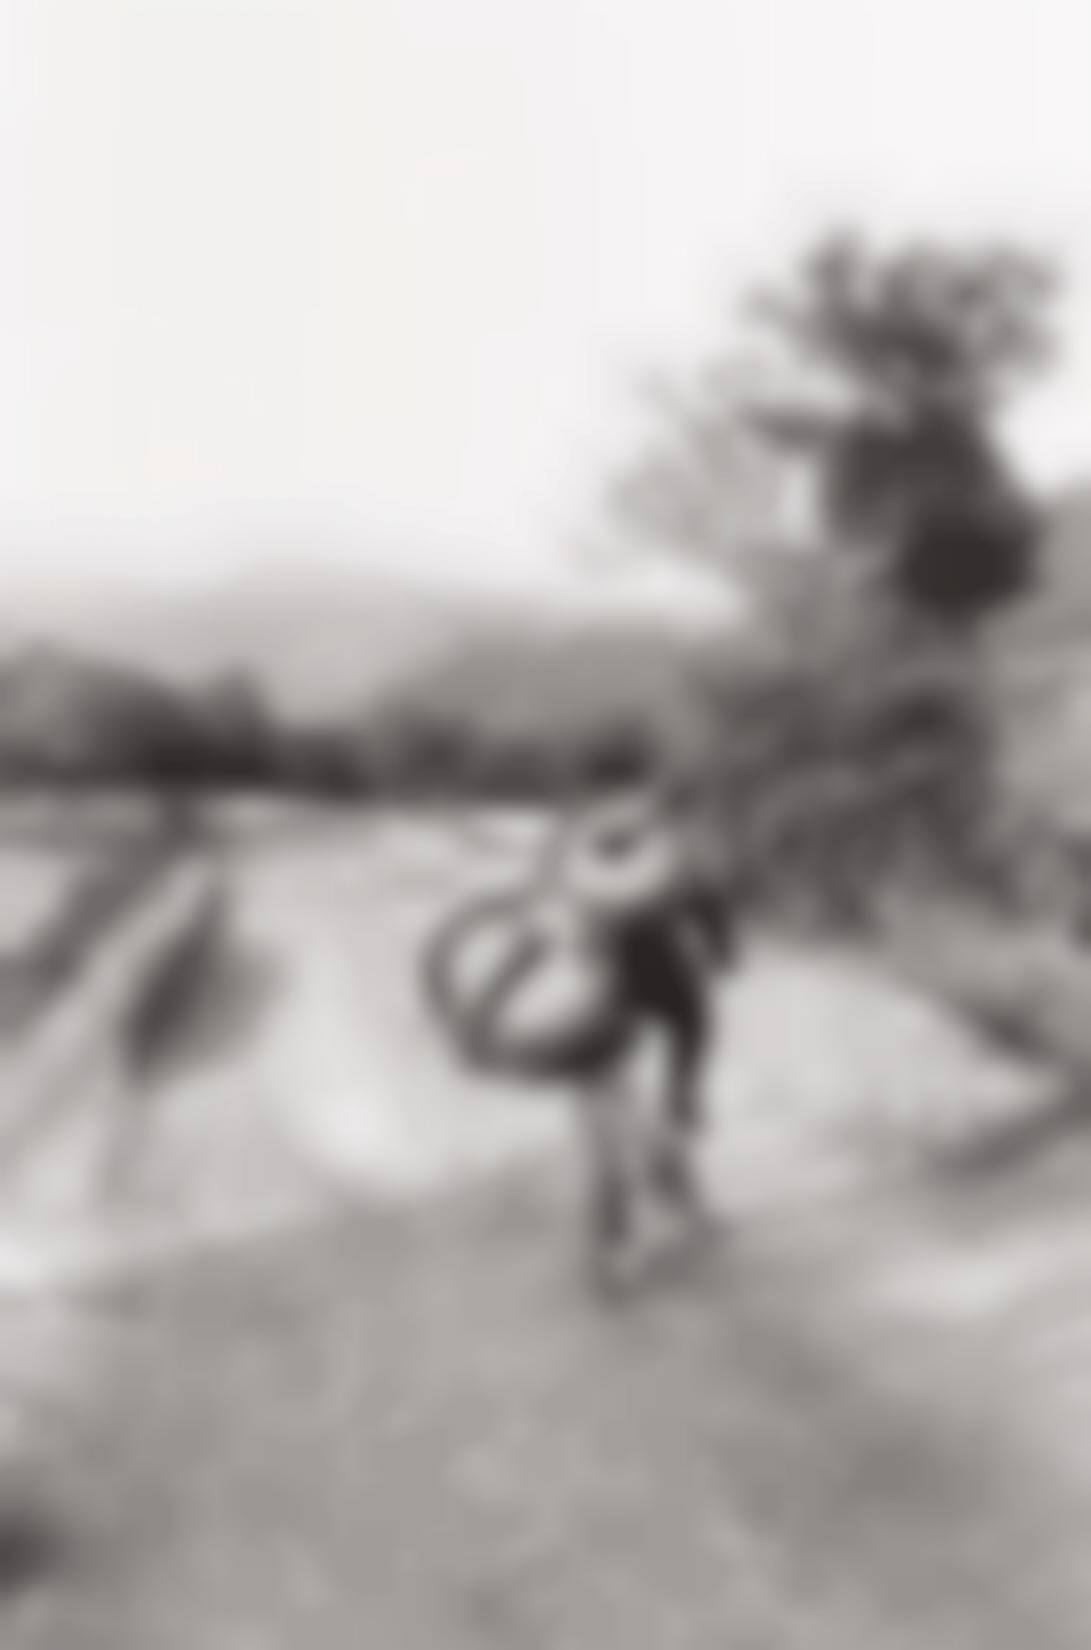 Henri Cartier-Bresson-Bass Player On The Road Belgrade-Kraljevo, To Play At A Village Festival Near Rudnik, Serbia, Yugoslavia-1965